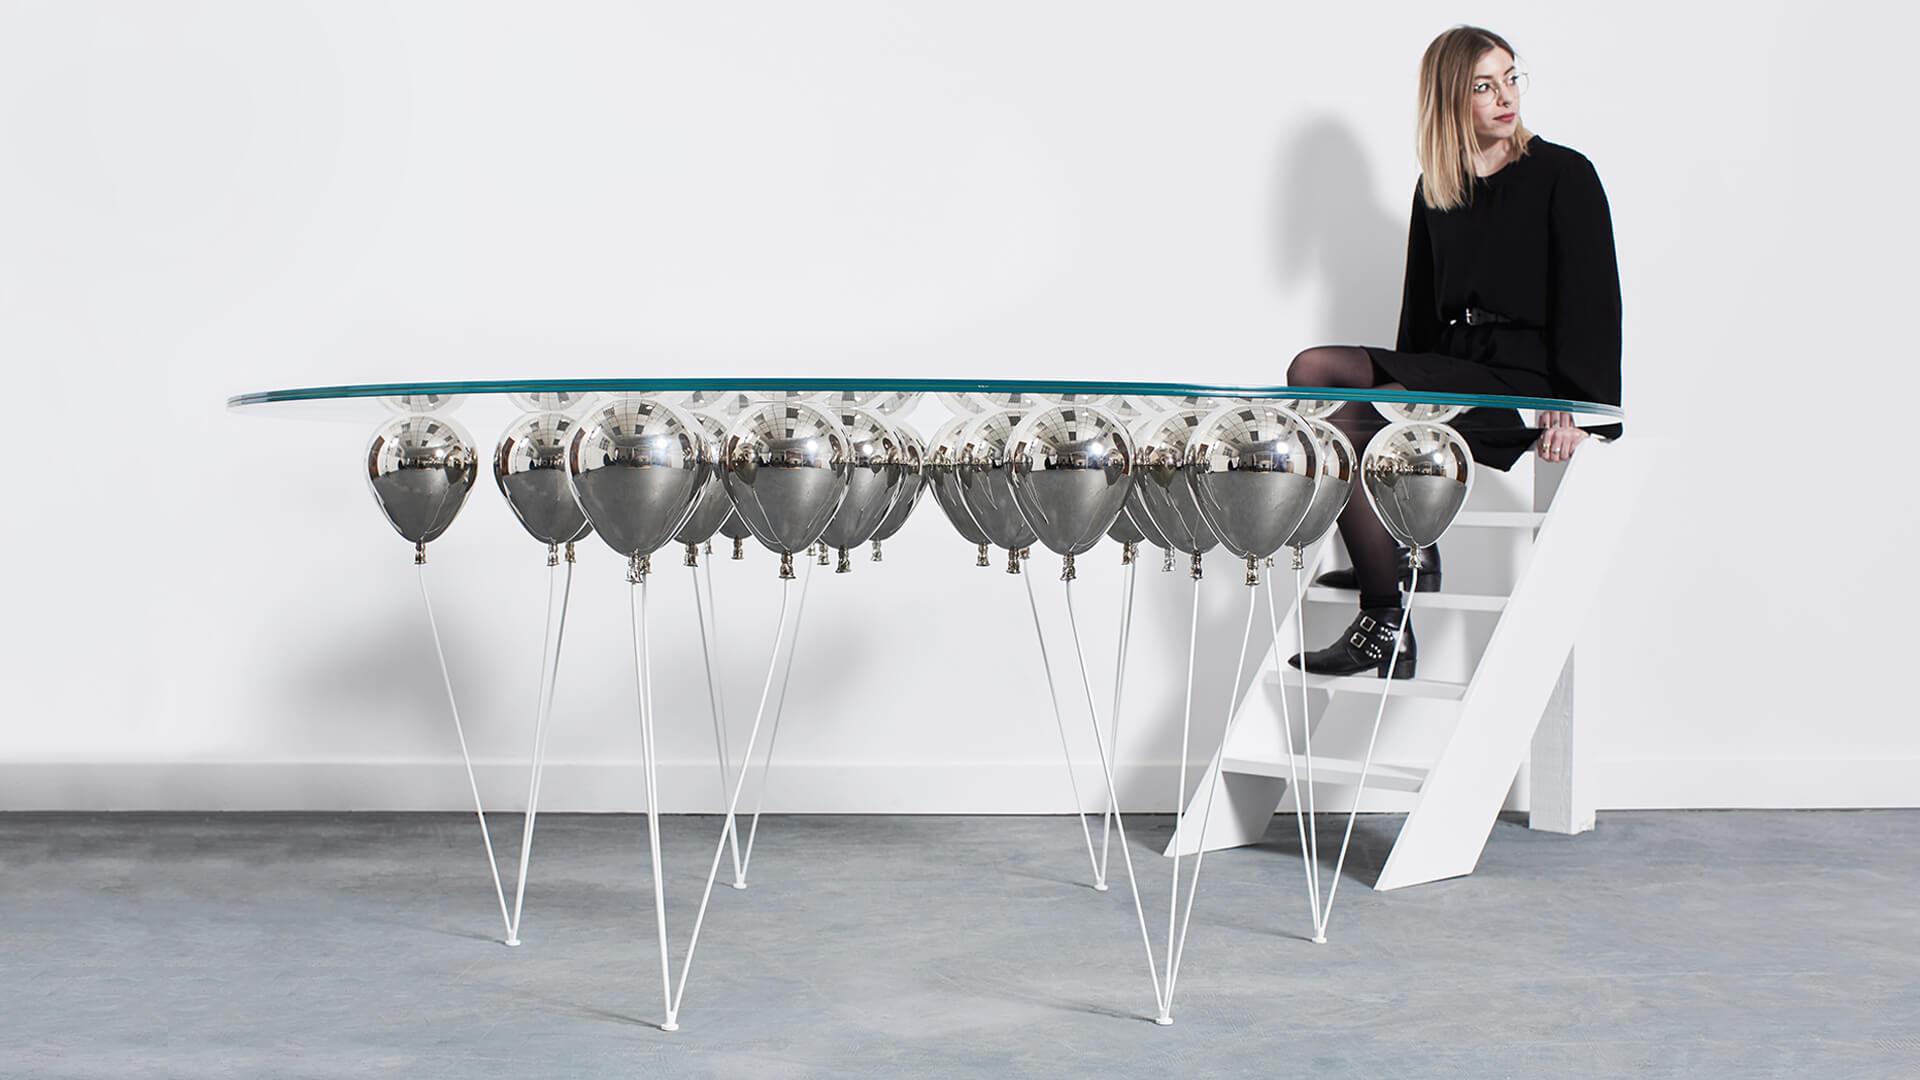 Balloon Dining Round_Carousel_03